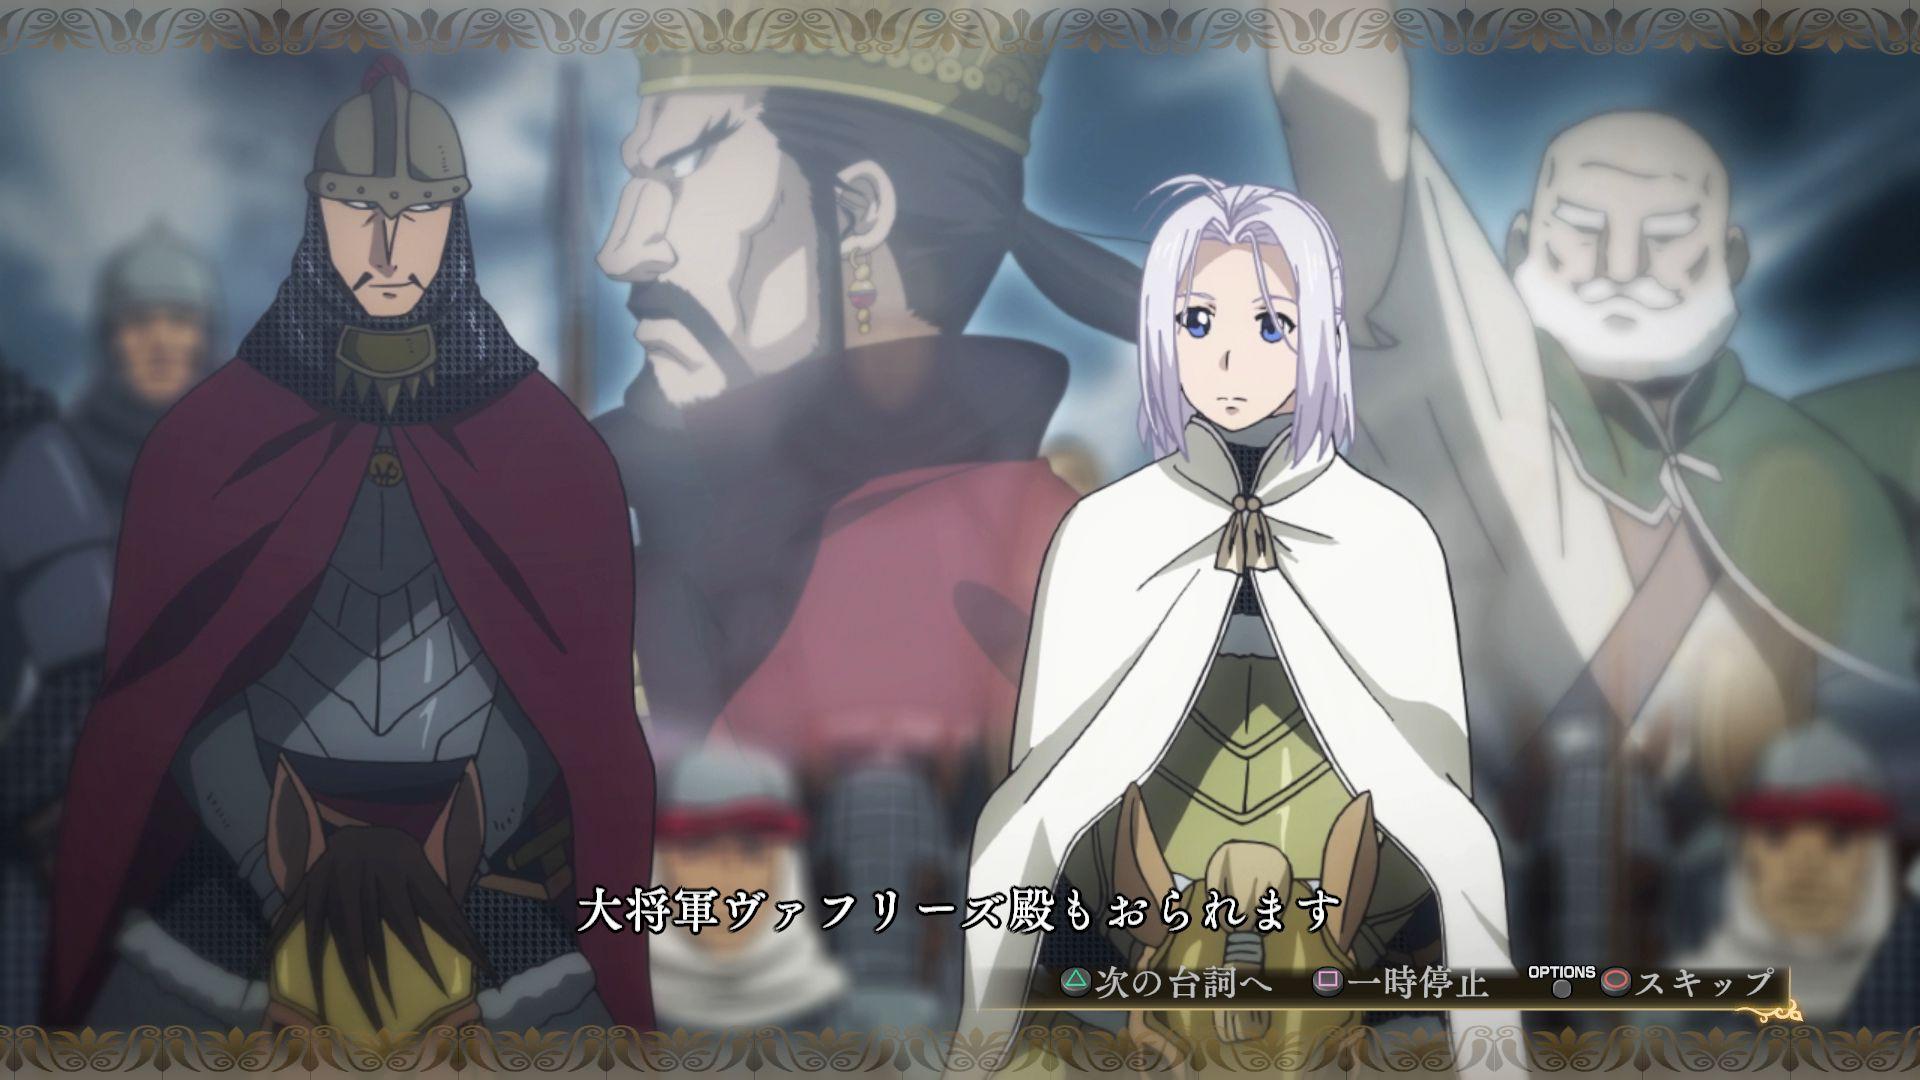 arslan-x-the-warriors-of-legend-183757-1446039006-high